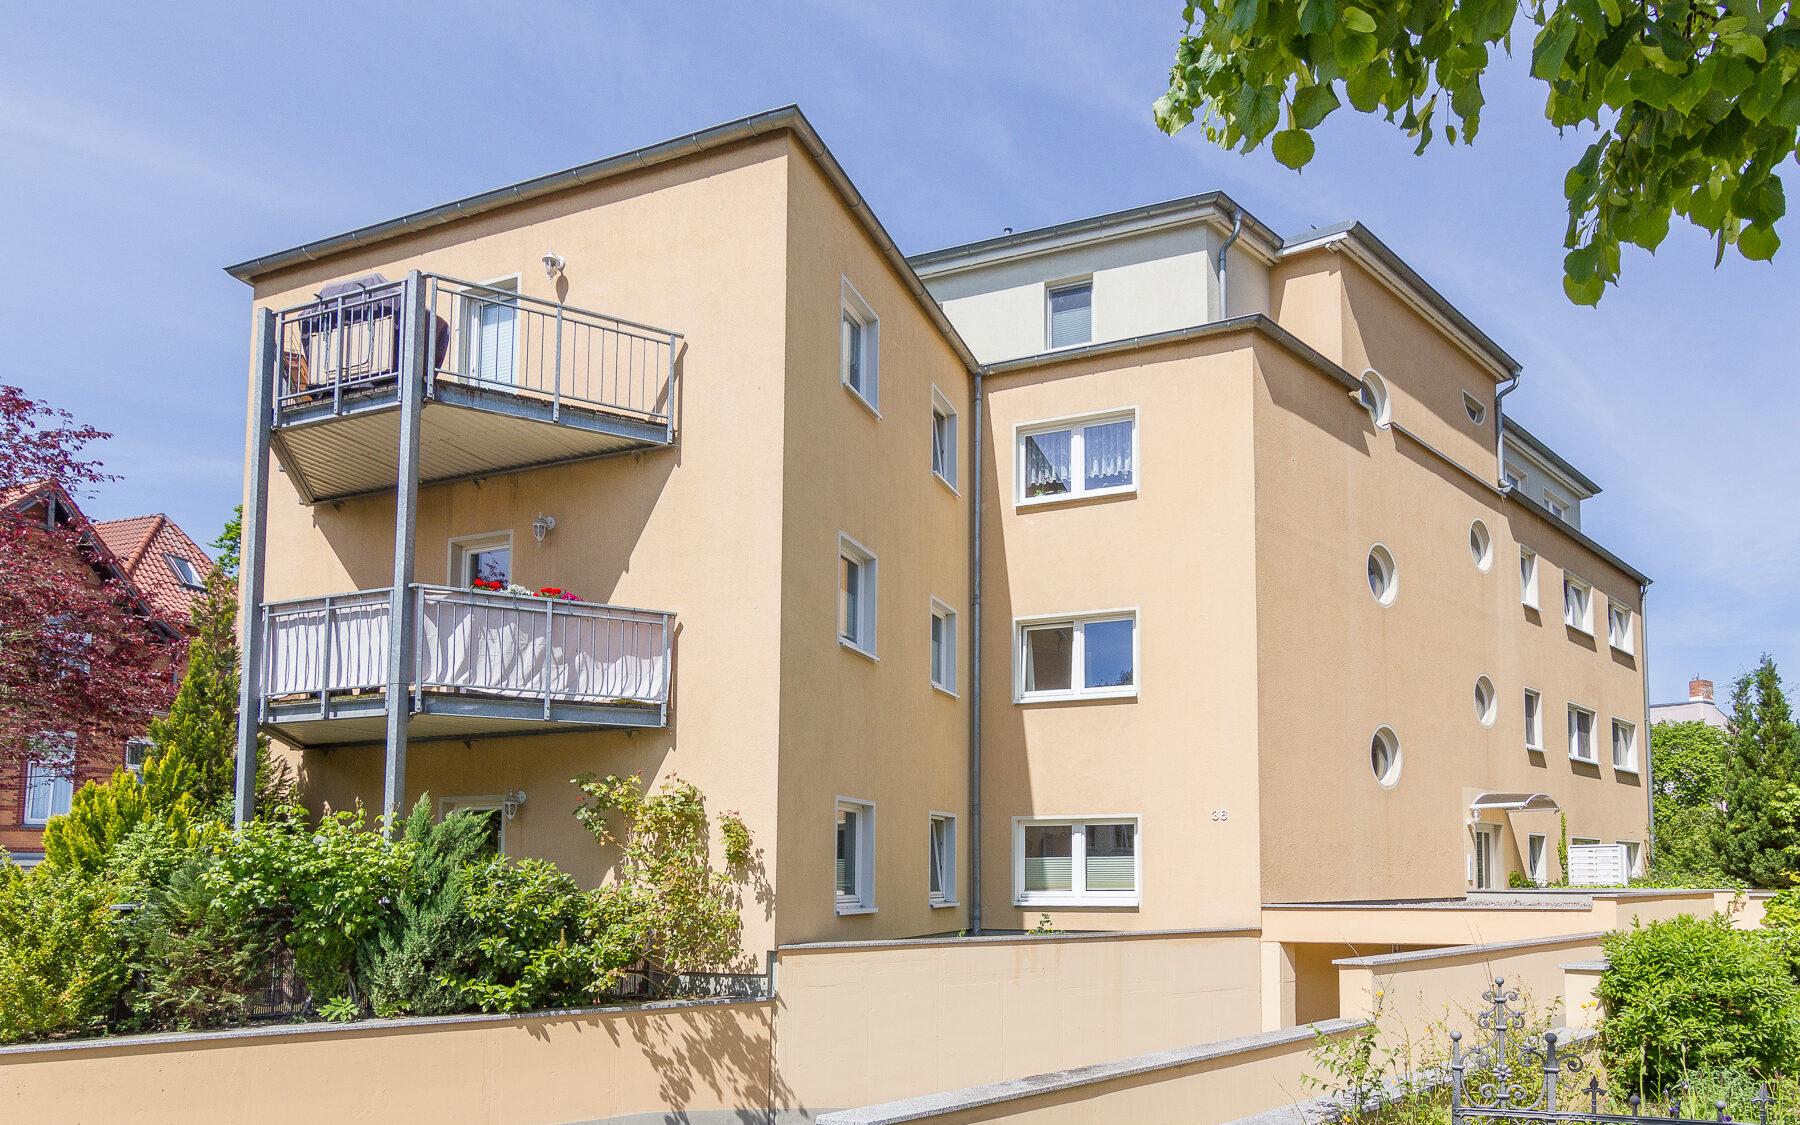 Eigentumswohnung-Rostock-2